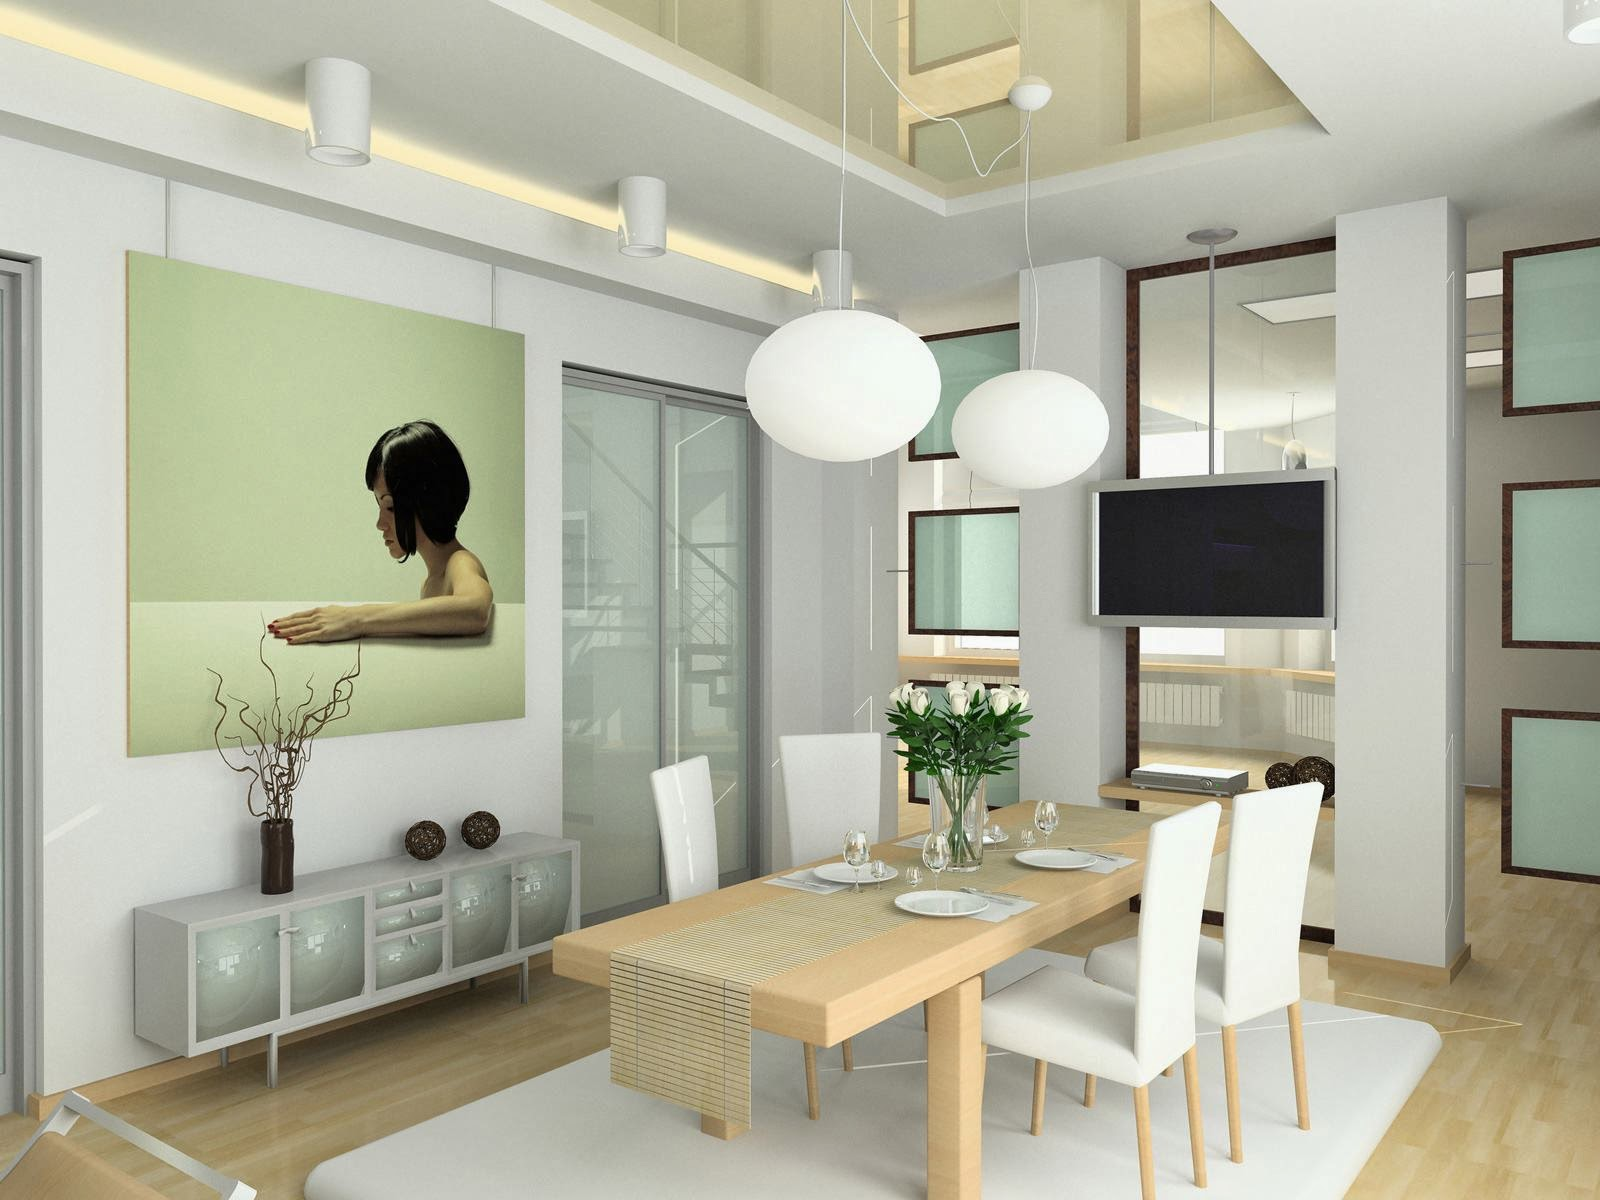 Ruang makan ukuran besar modern minimalis